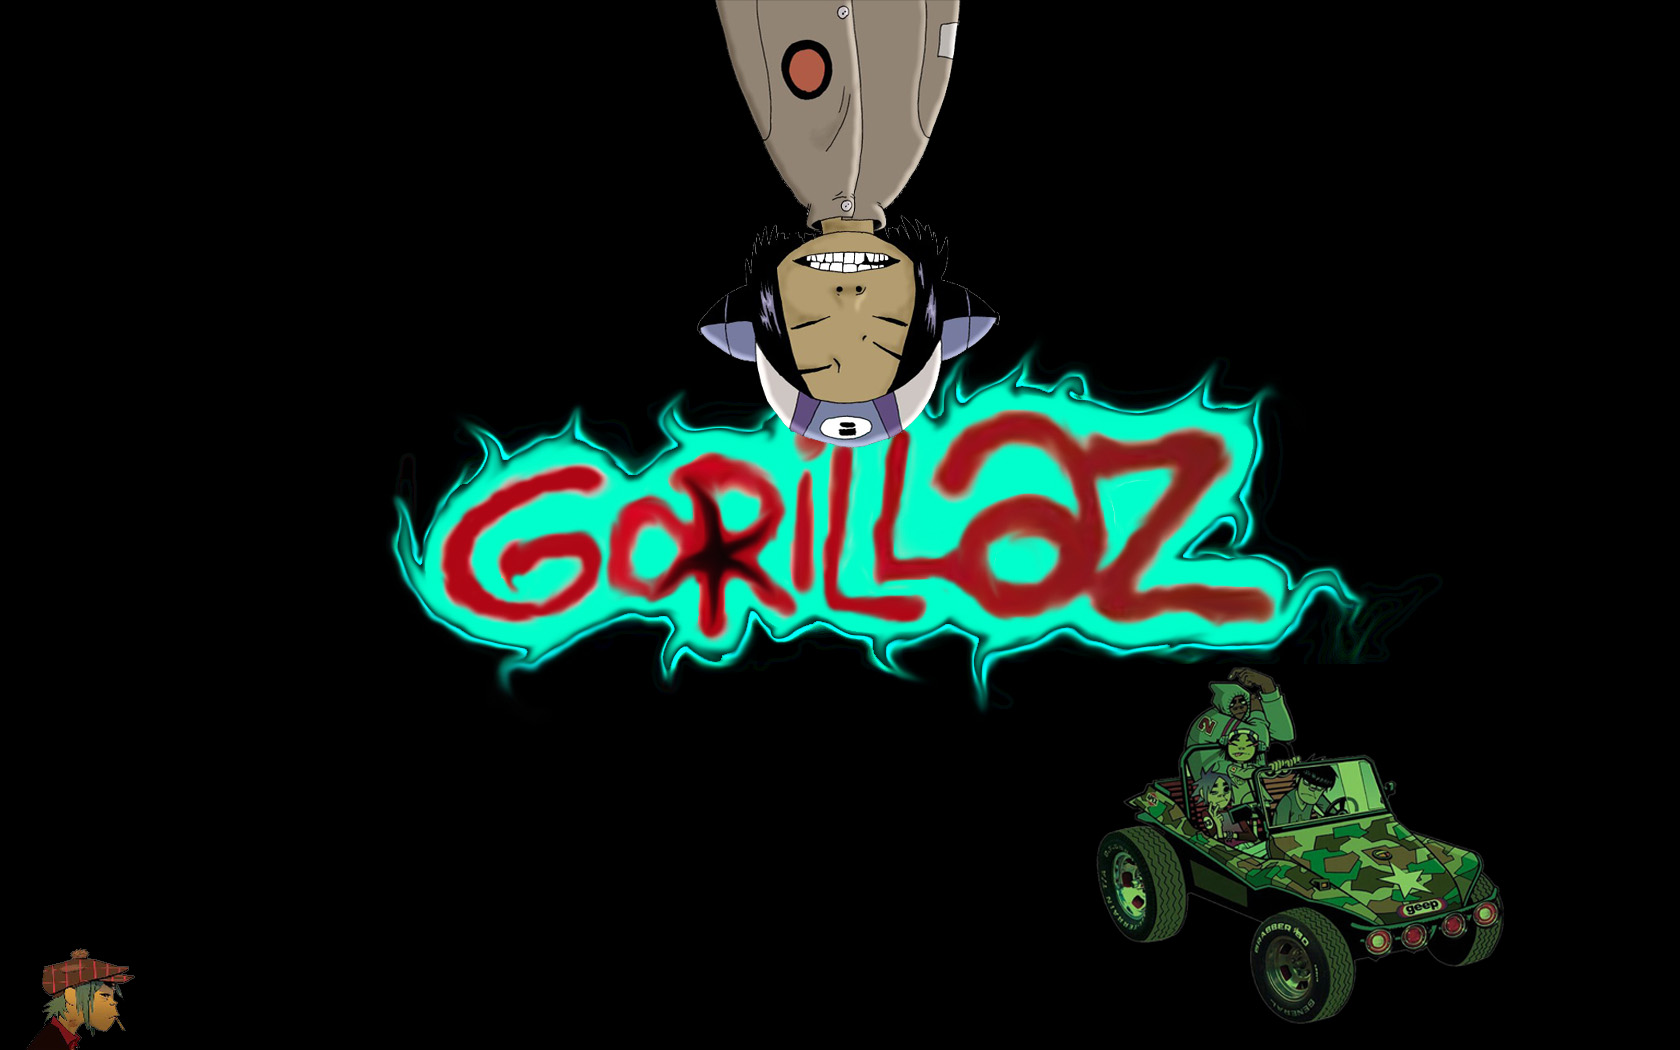 Gorillaz Wallpaper Android - WallpaperSafari